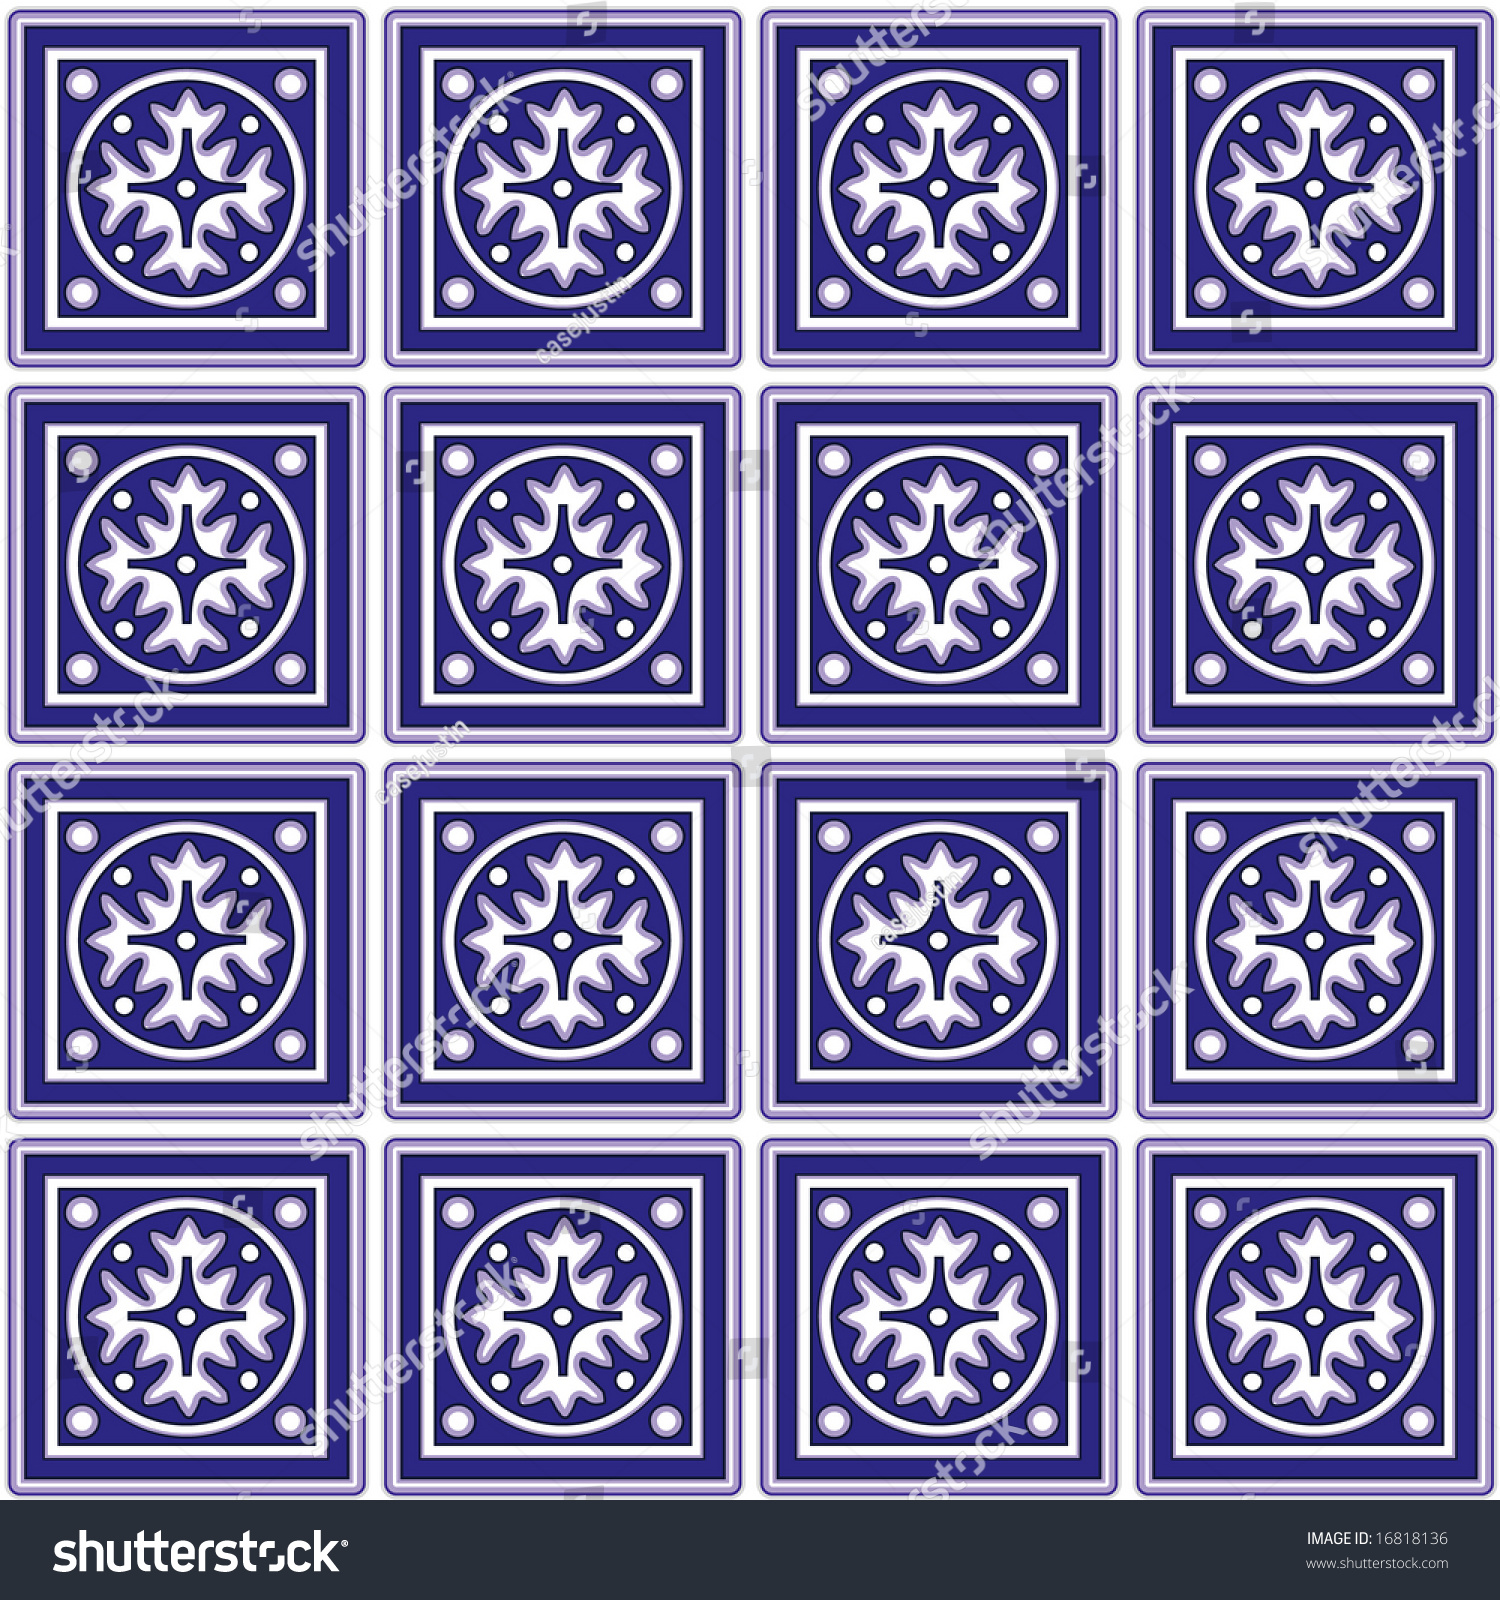 kitchen tiles classic blue white ceramic stock illustration